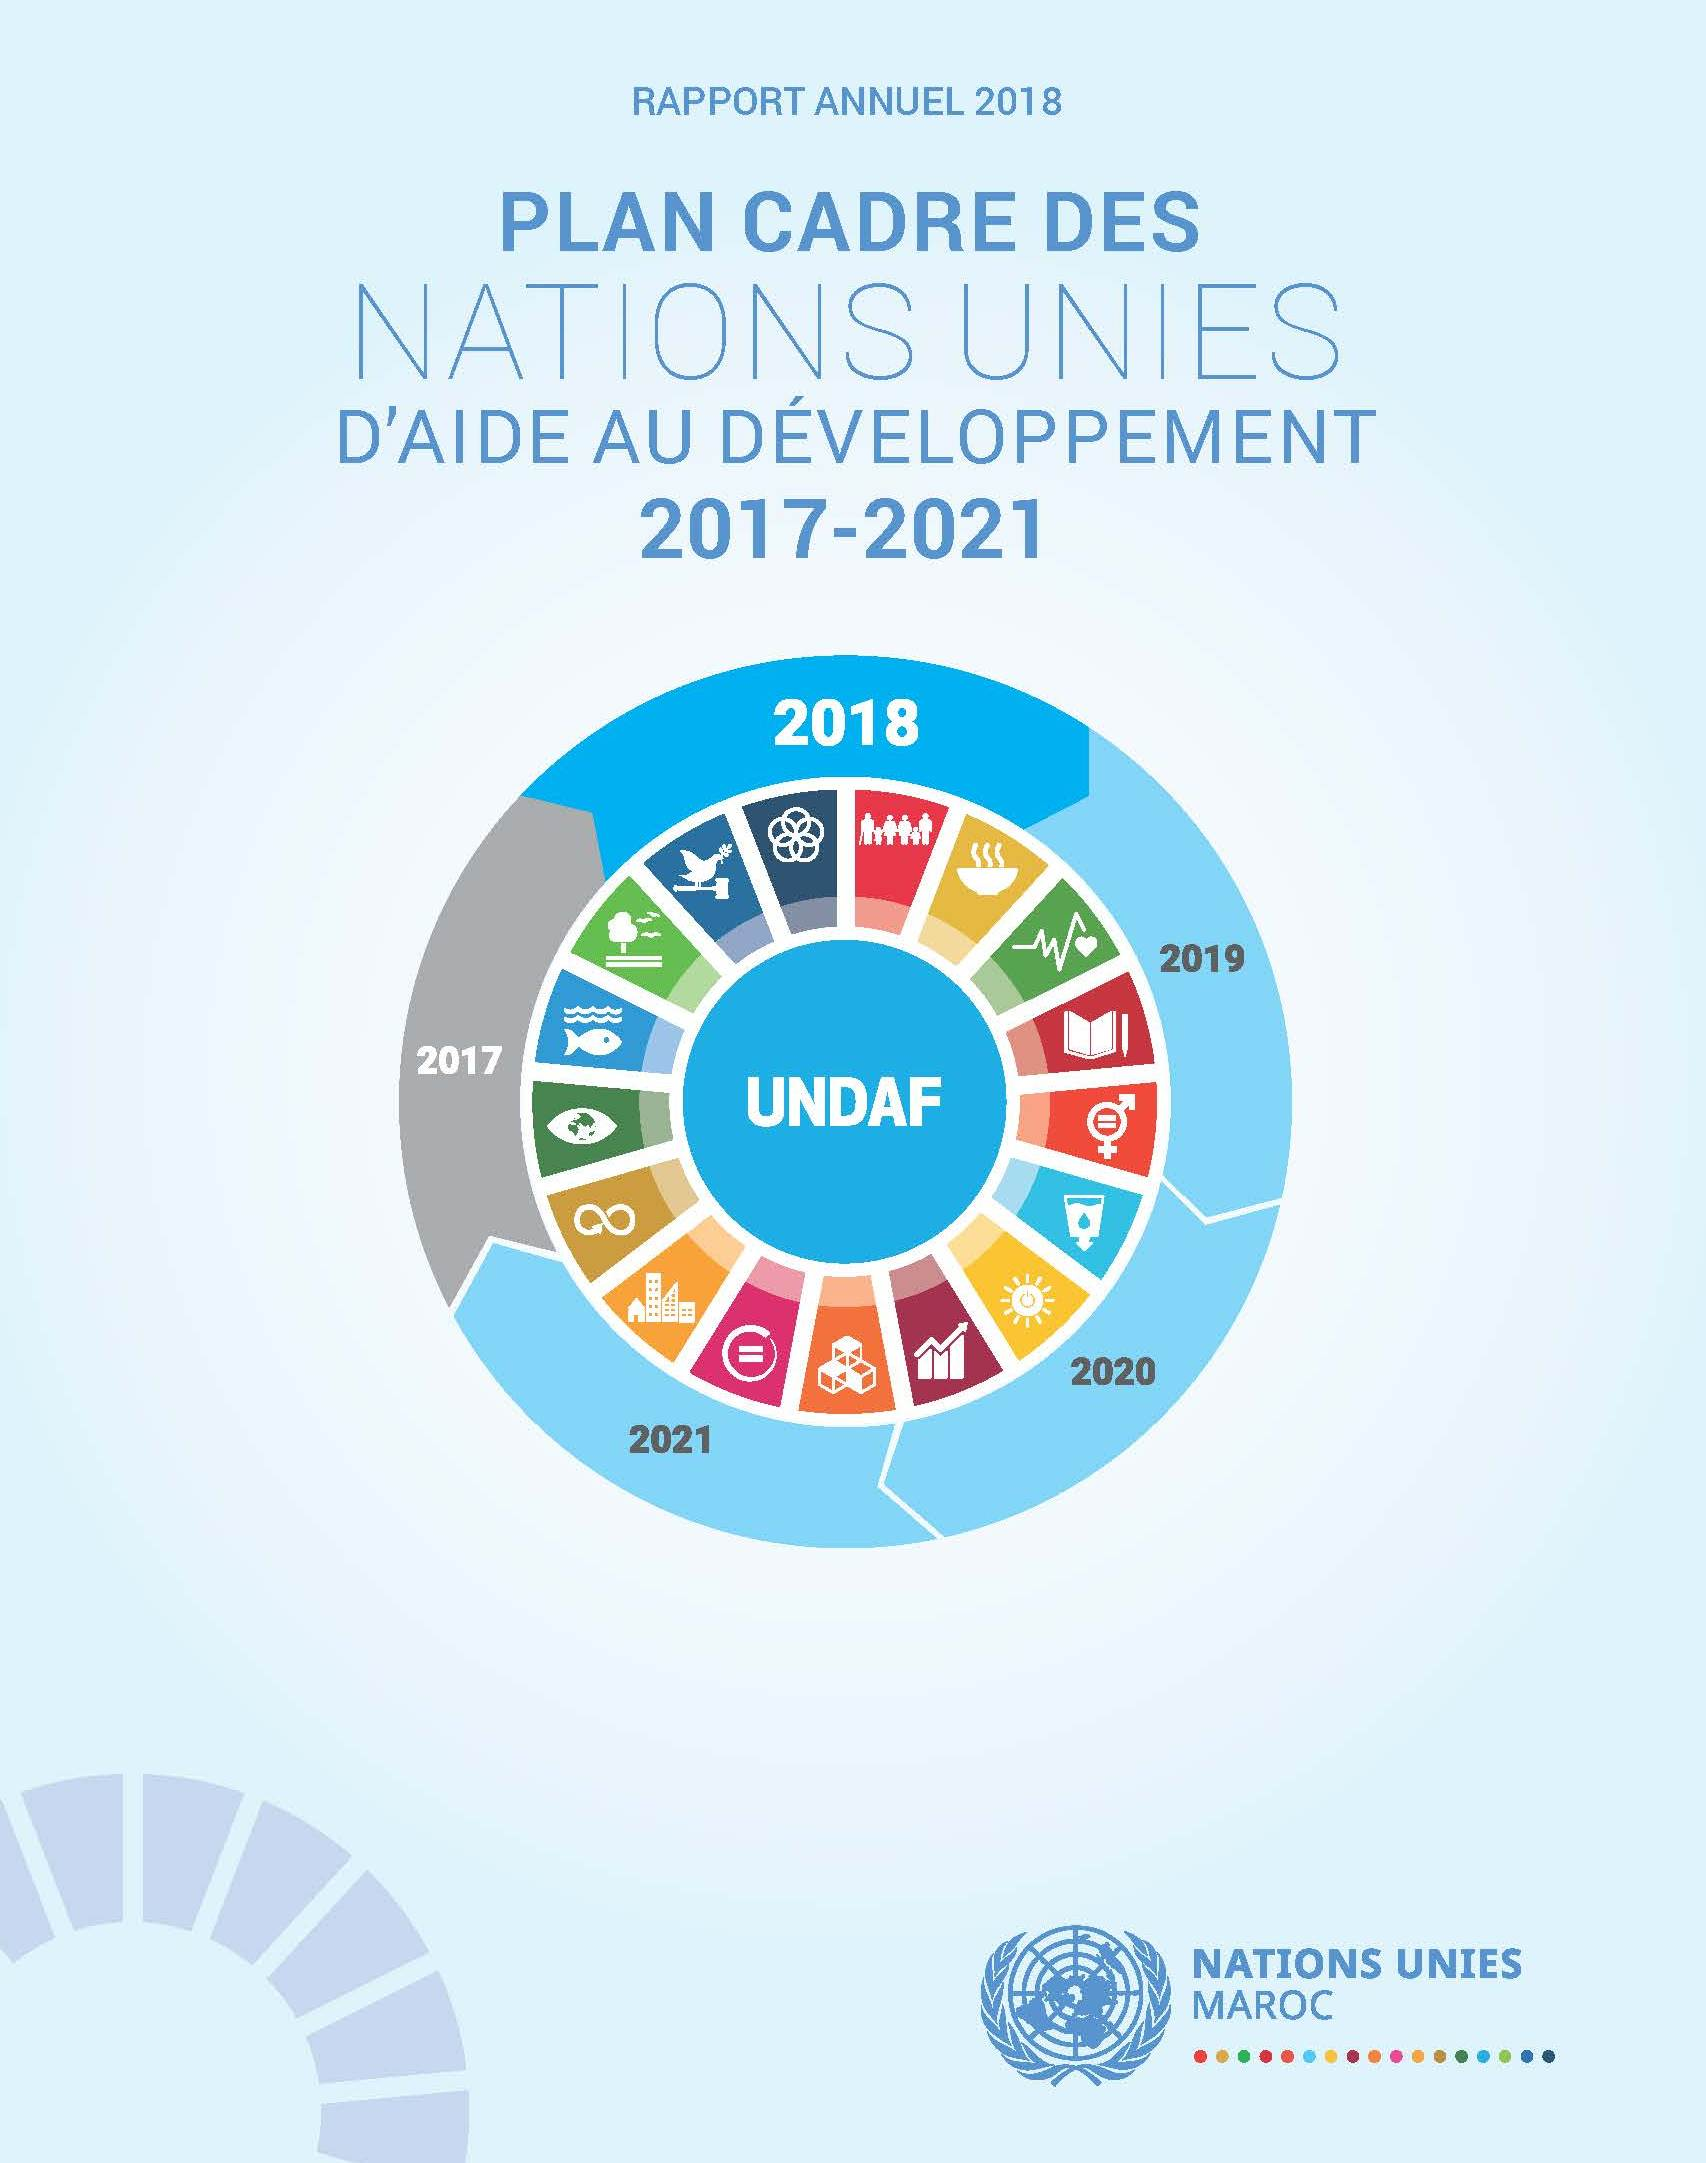 Rapport annuel UNDAF 2018